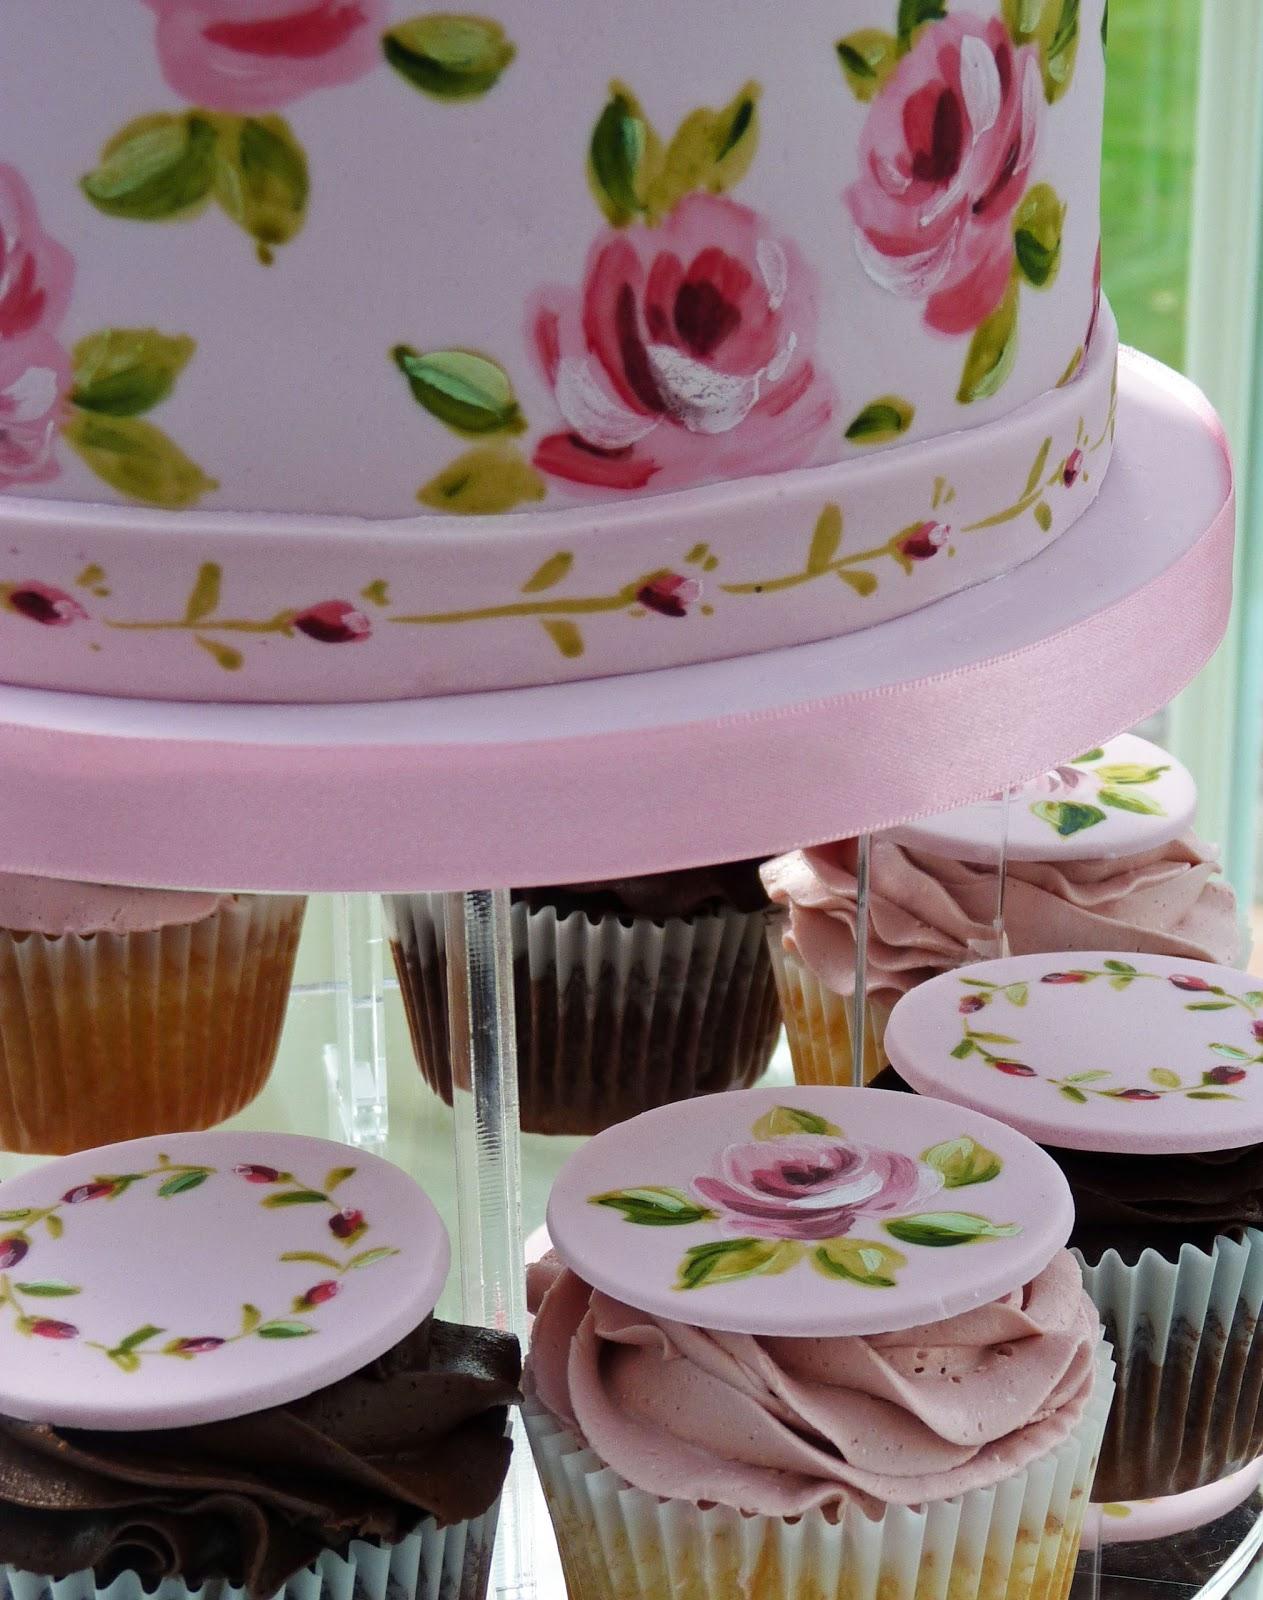 Amelies House Wedding Cakes - Selfridges Wedding Cakes